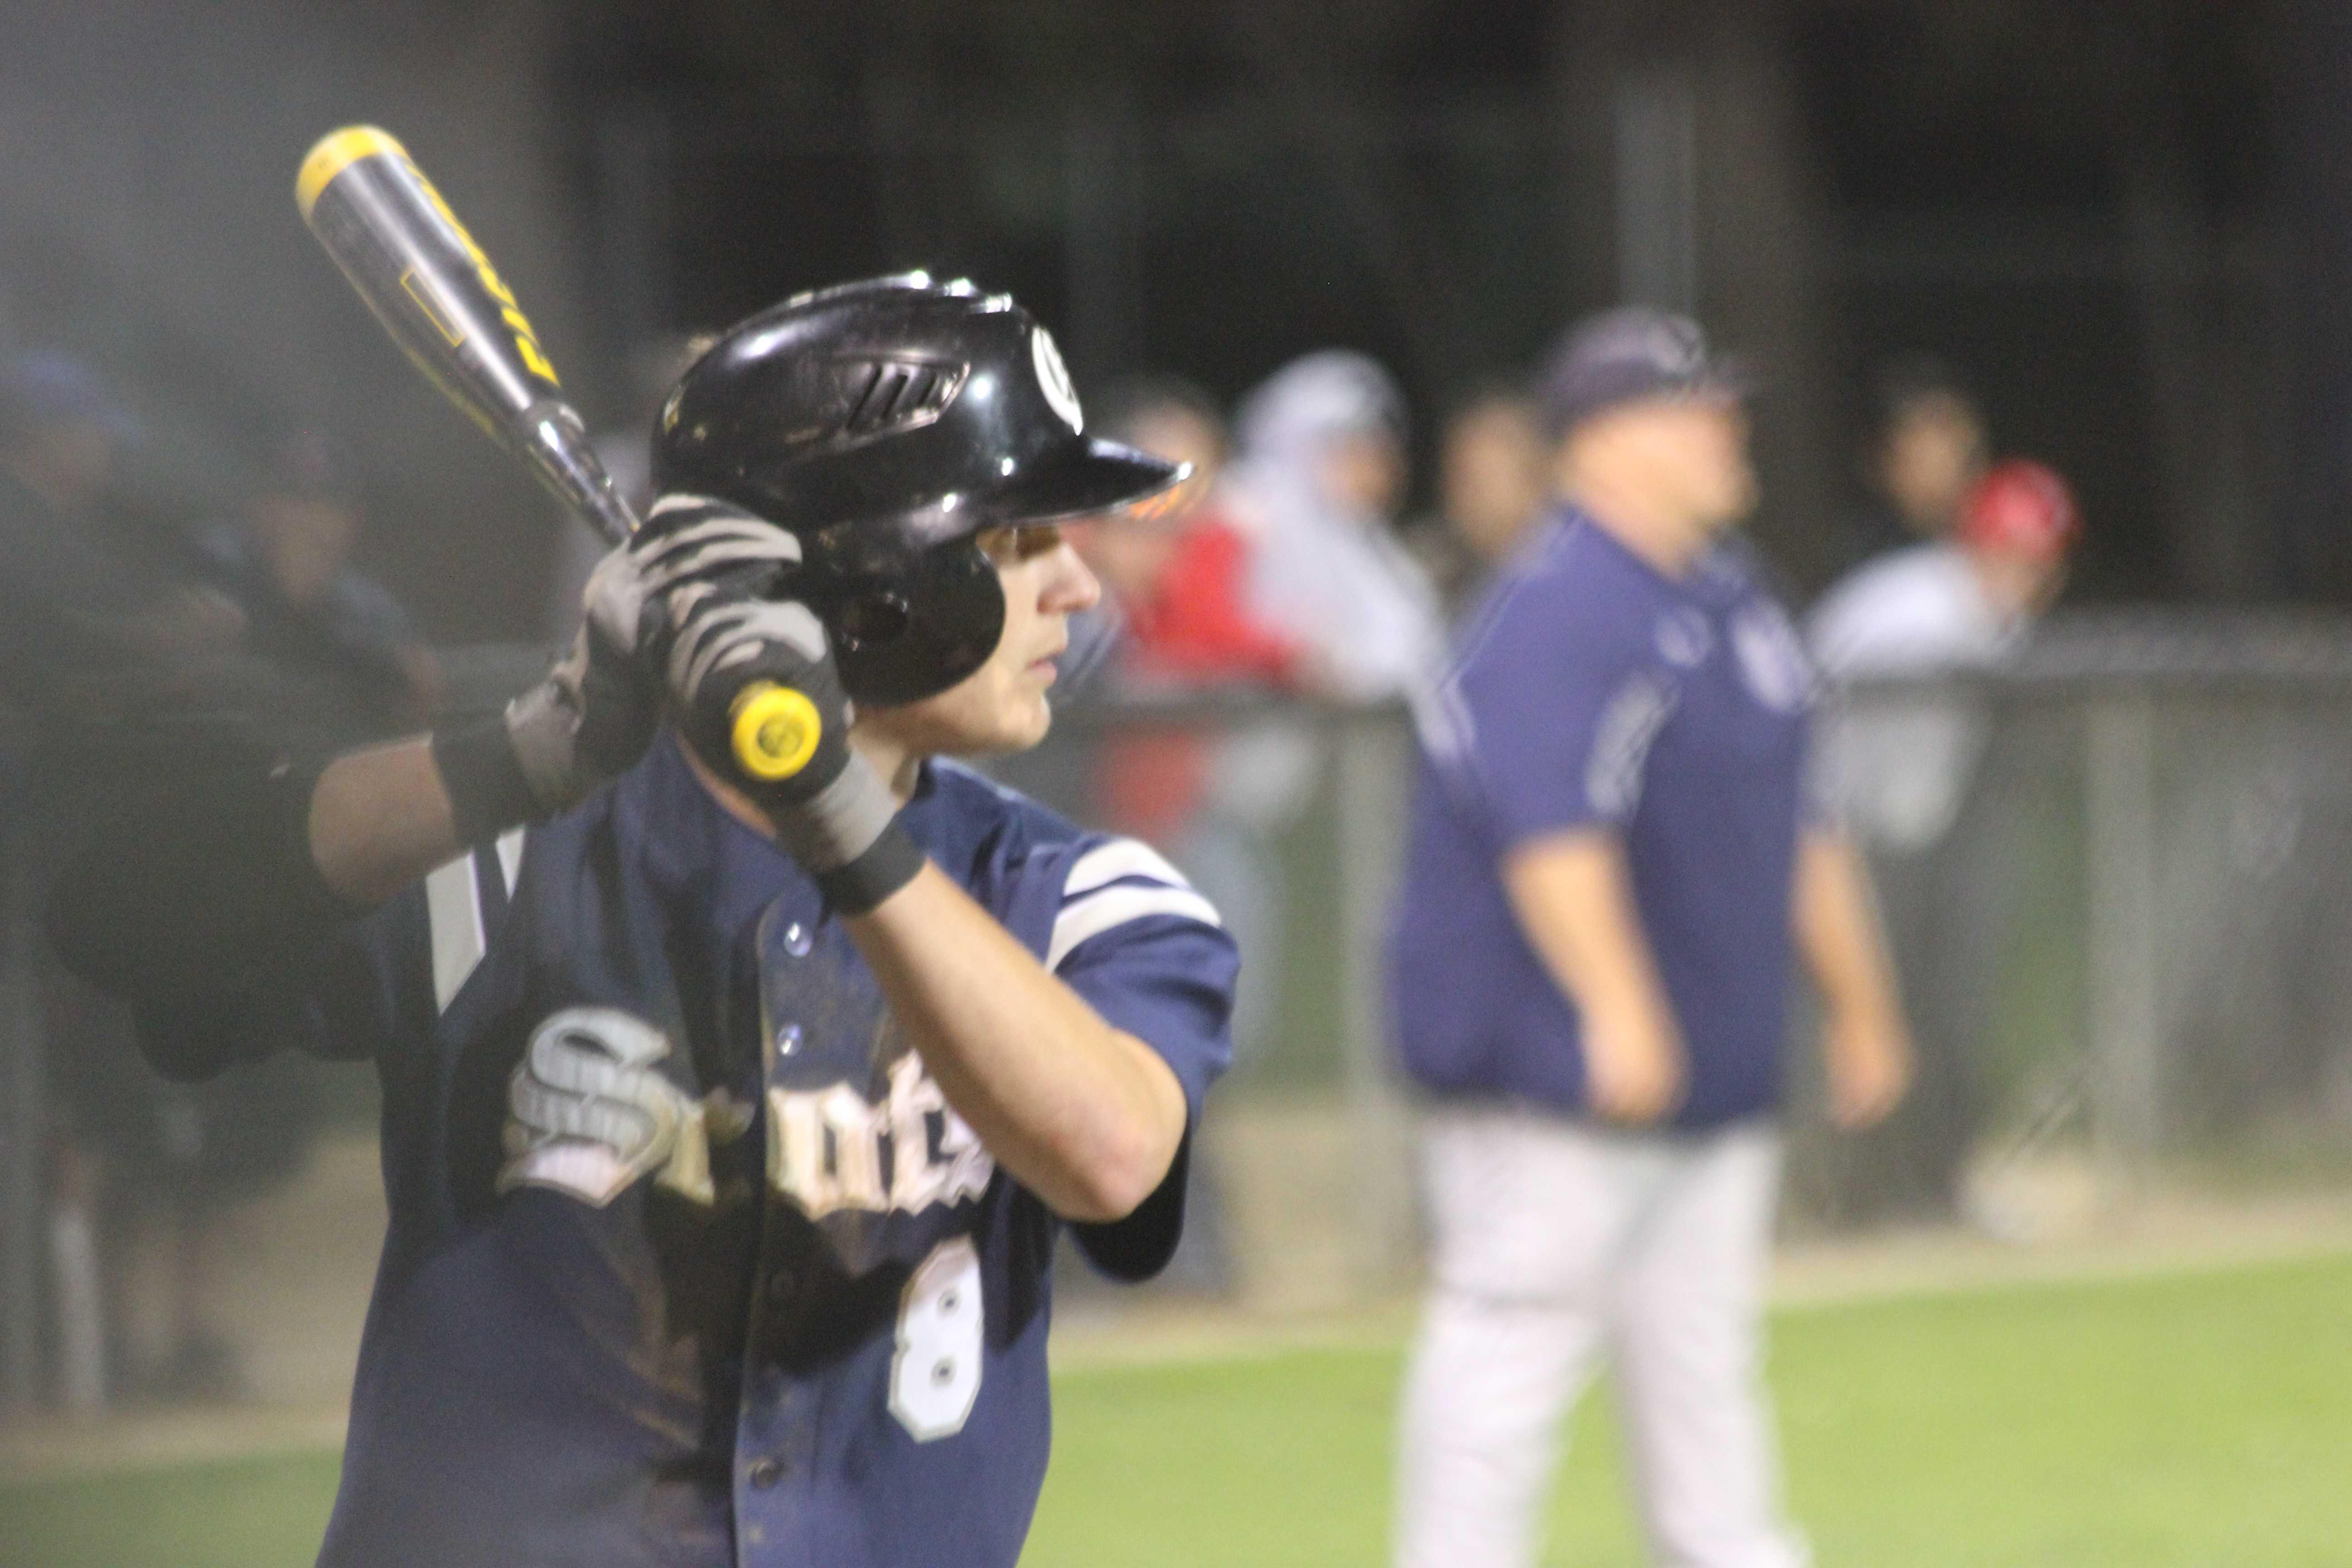 junior Matt Seubert during his at bat against Burlingame High School Friday night